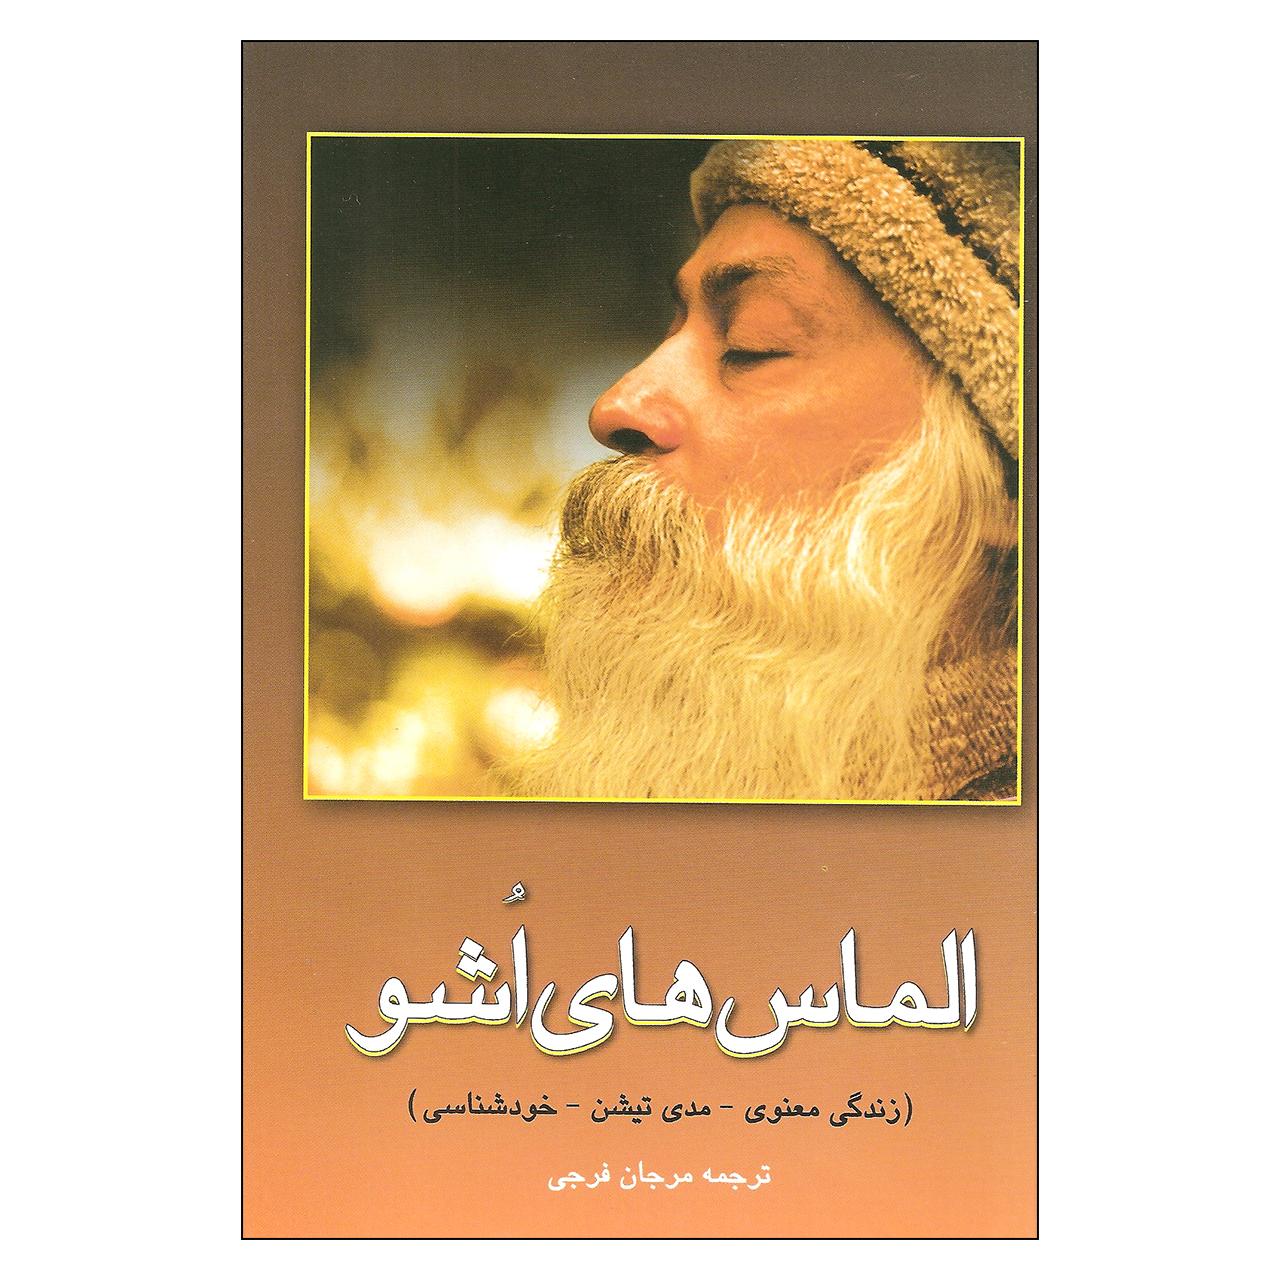 کتاب الماس های اشو اثر اشو نشر فردوس